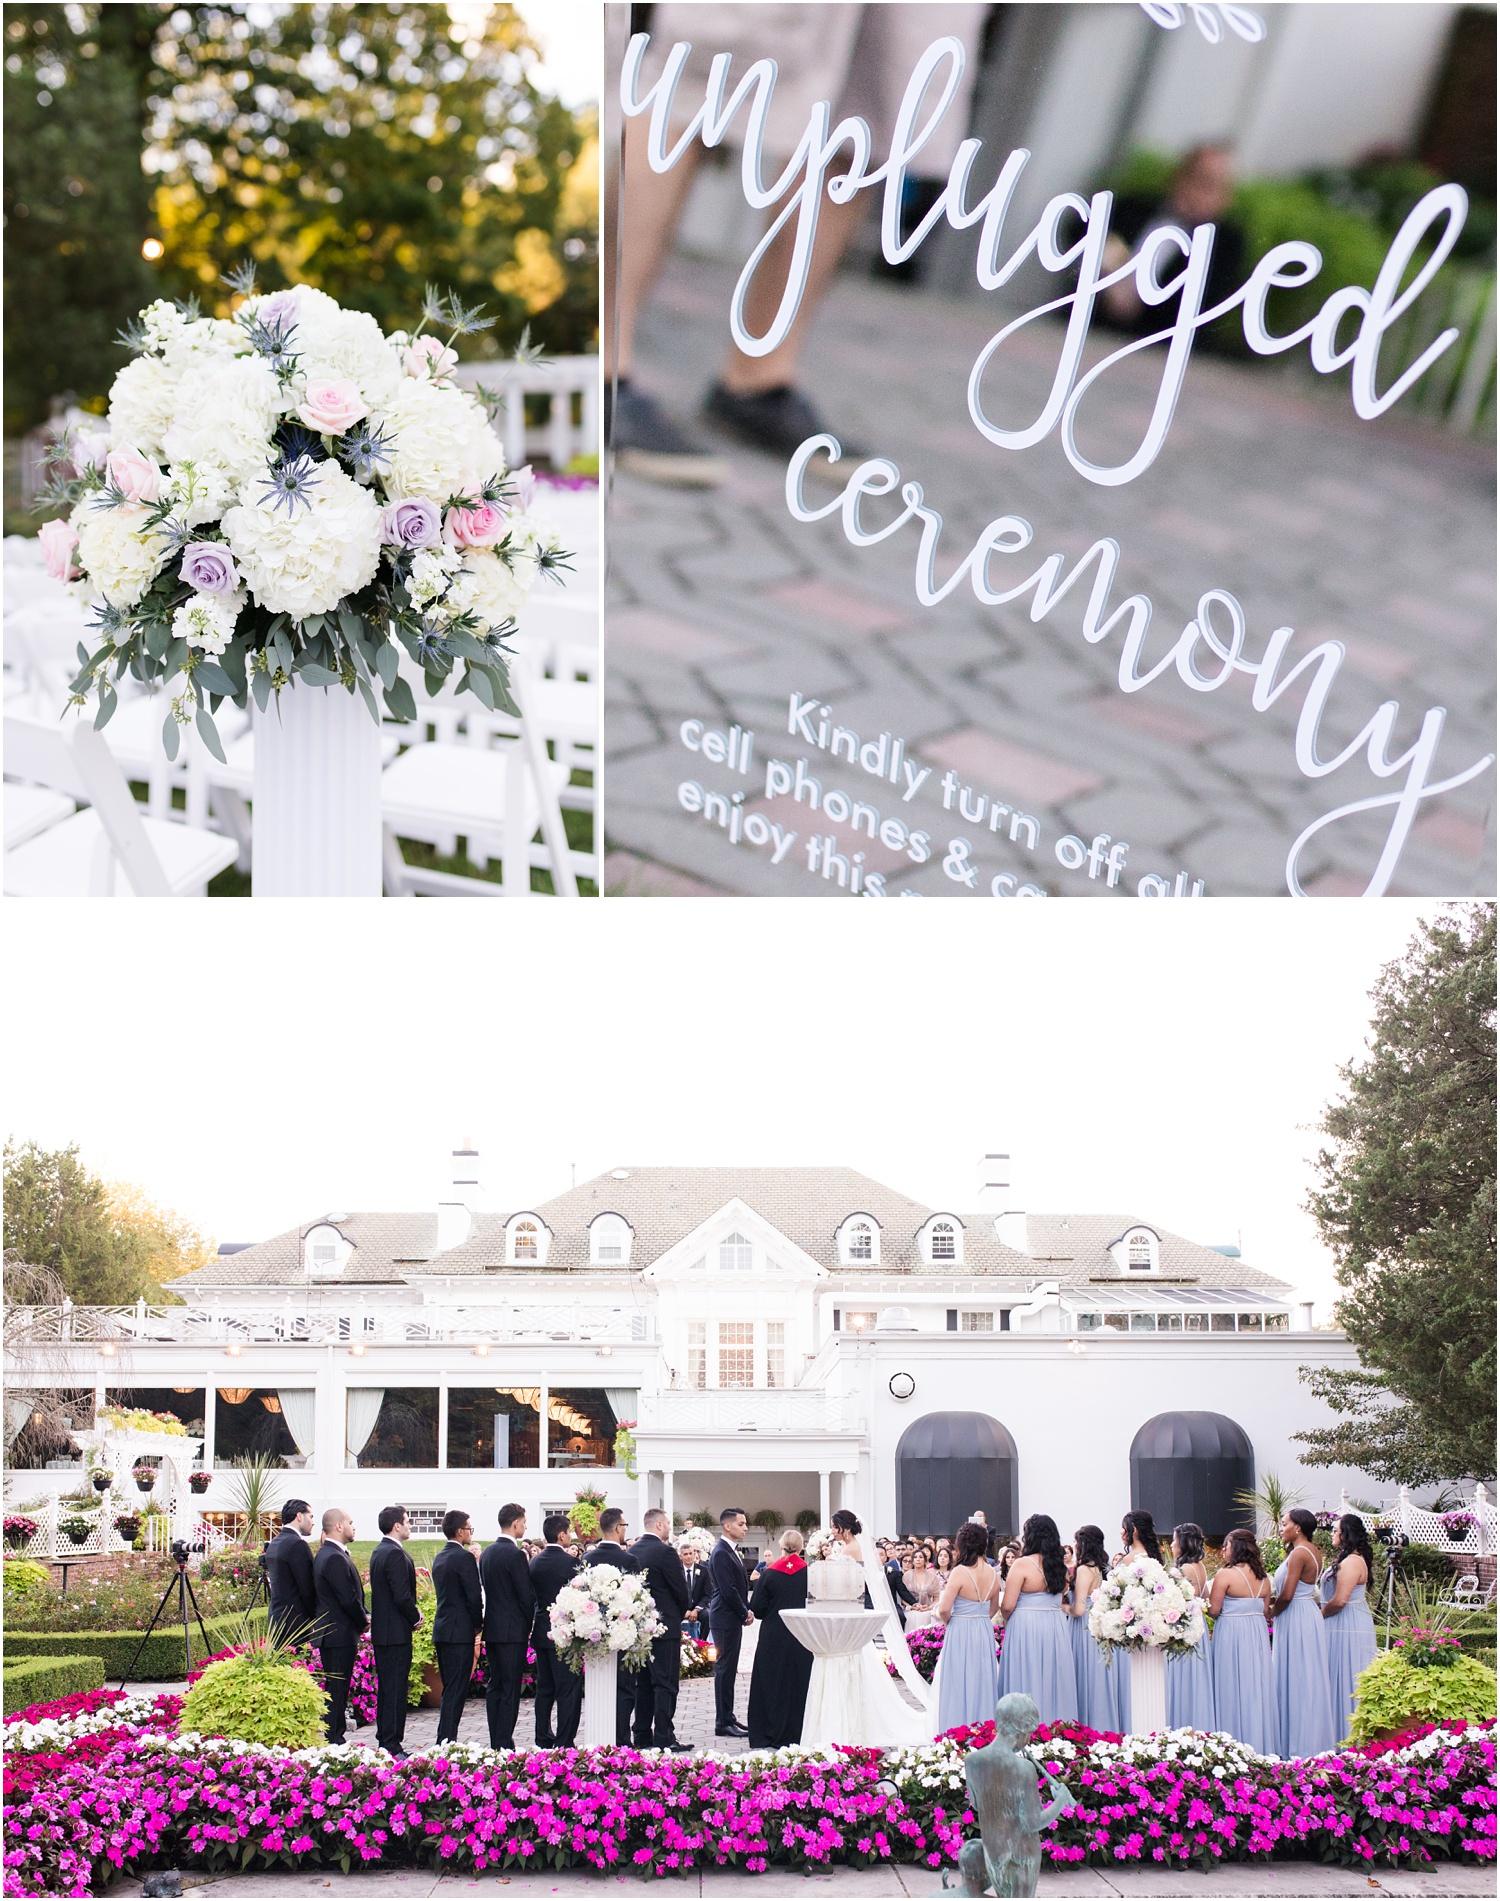 Wedding ceremony in the garden at The Shadowbrook in Shrewsbury, NJ.